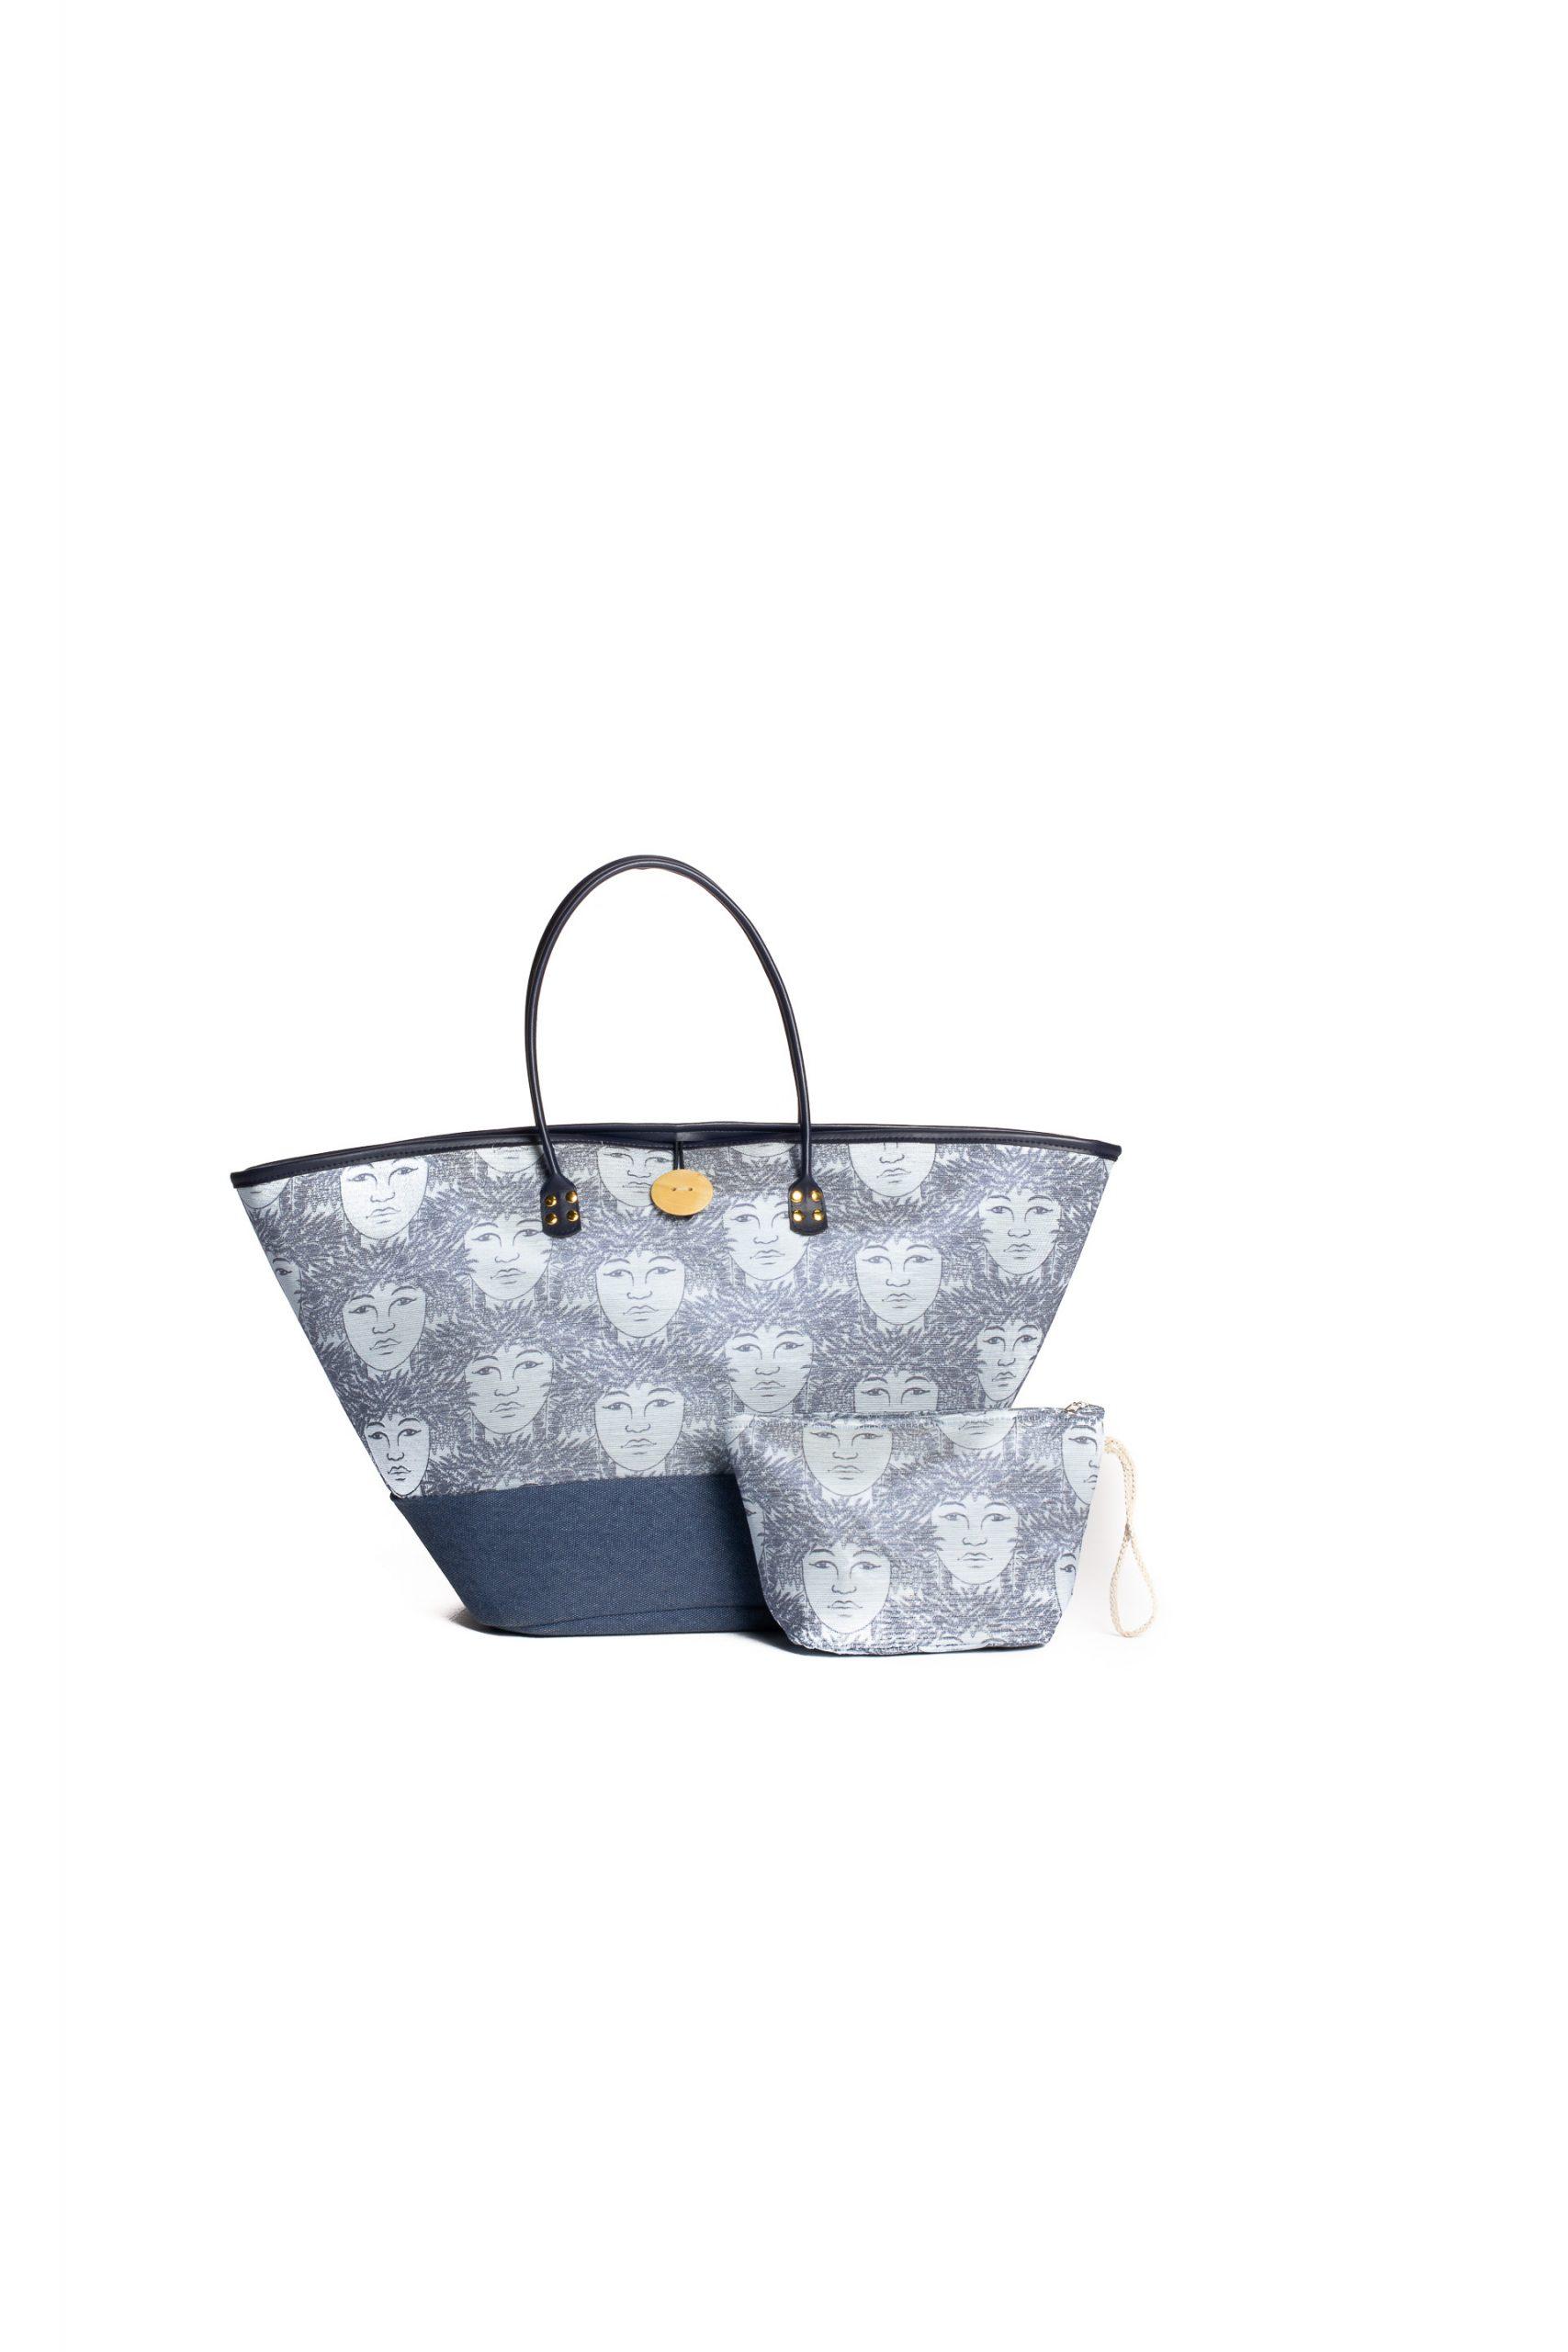 Puamelia Bag Set in Blue